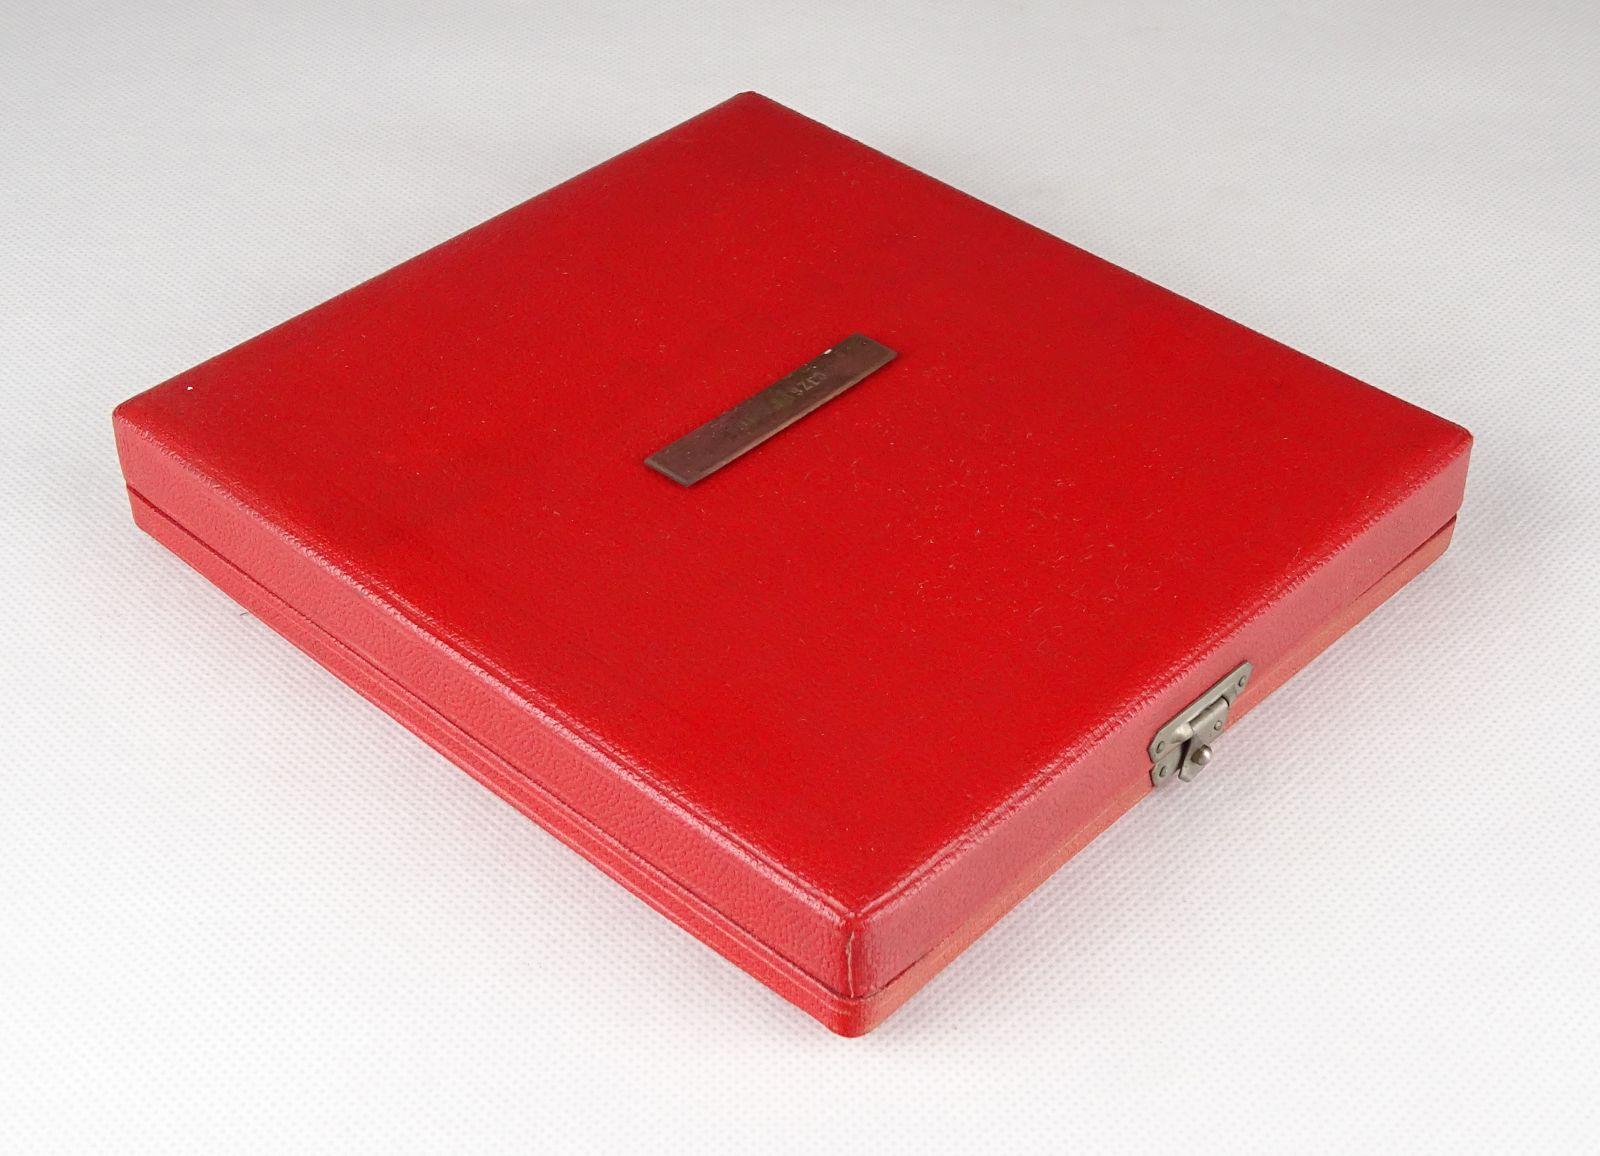 DSC03860.JPG (1600×1156)